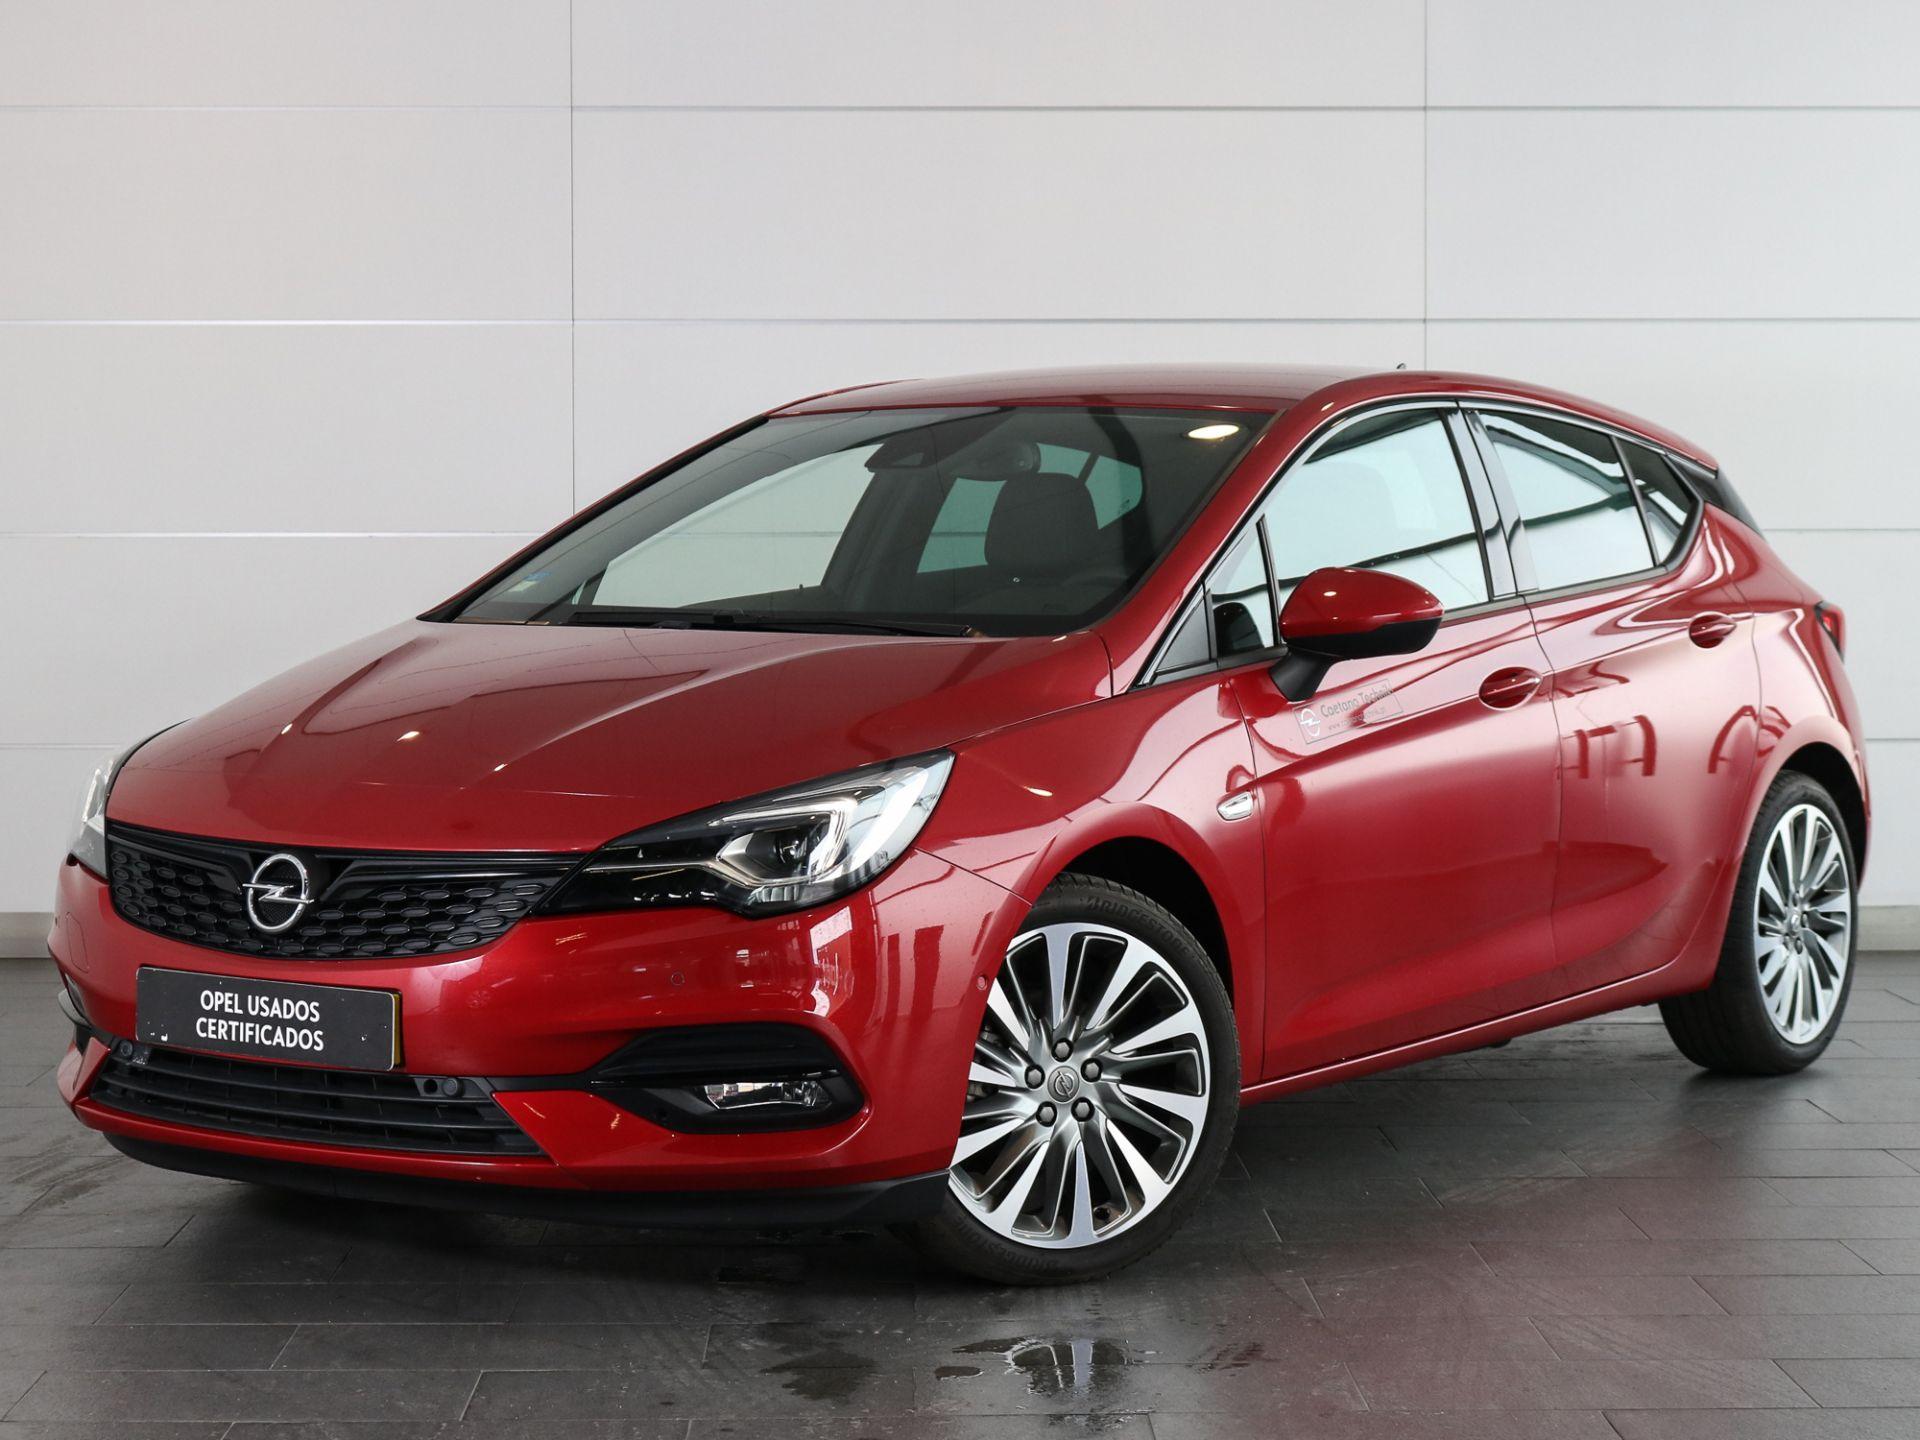 Opel Astra 1.2 Turbo 130cv Ultimate segunda mão Setúbal